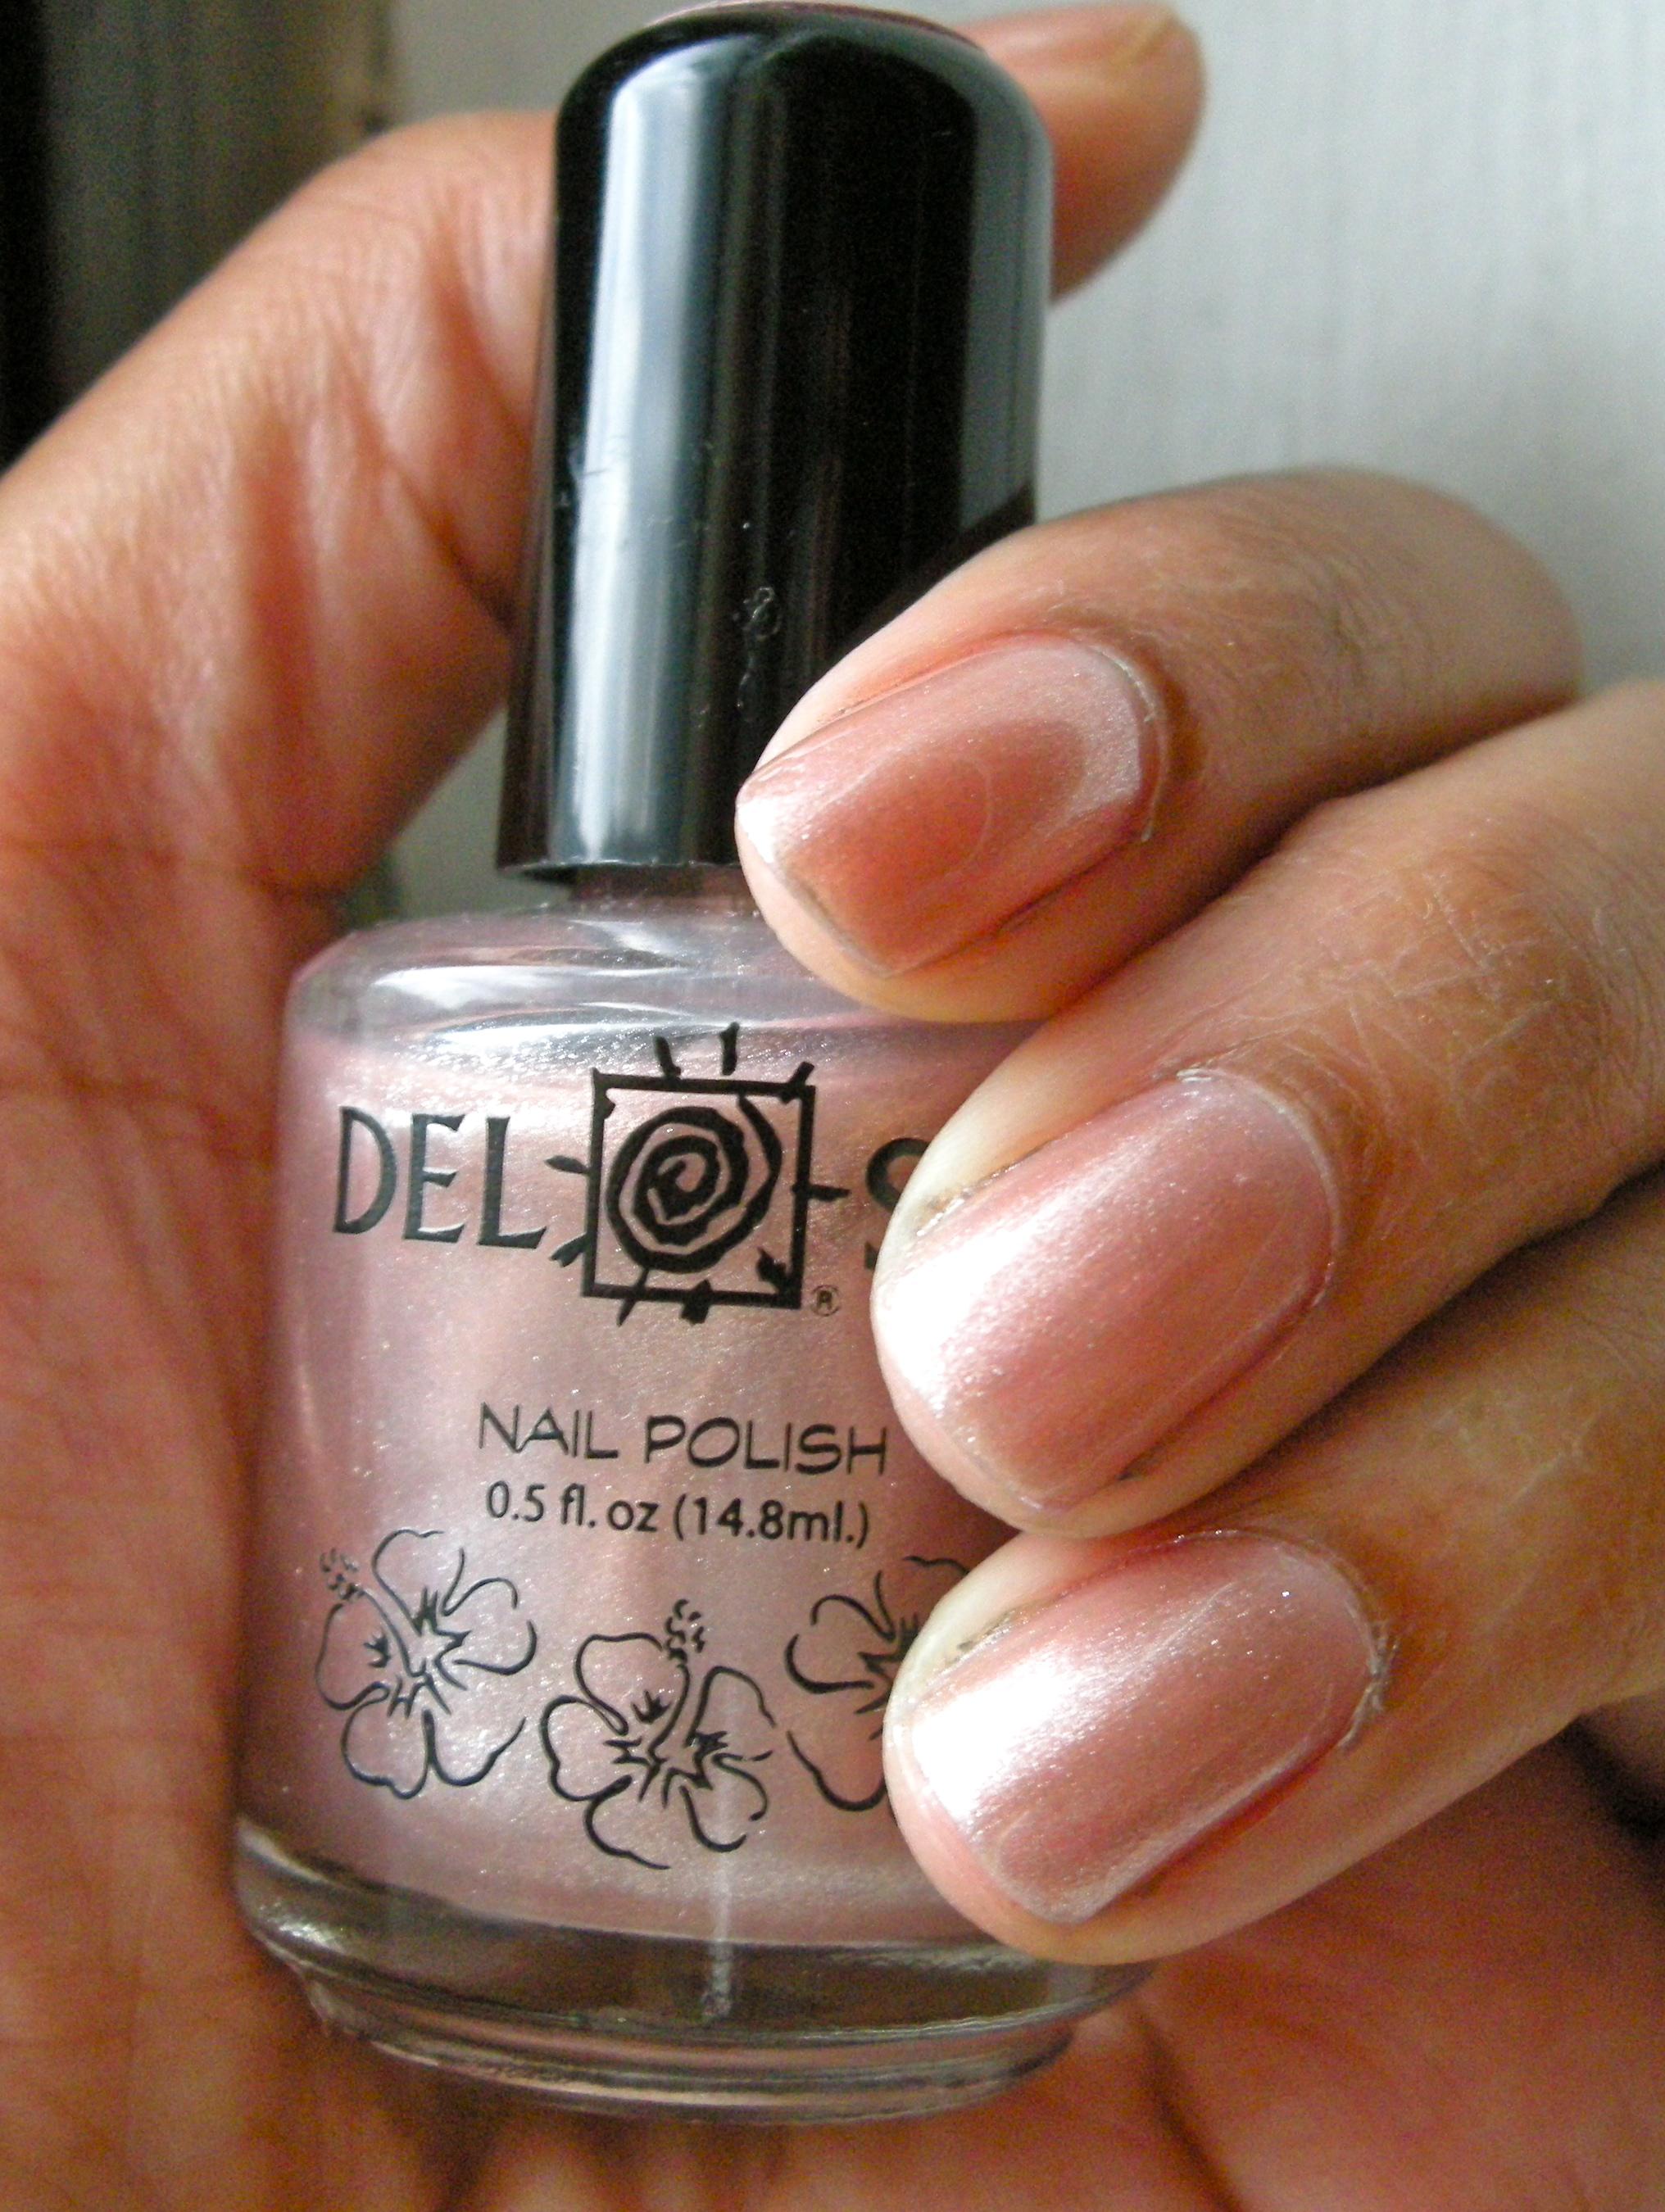 Del Sol Nail PolishReview. | Lacquerholic